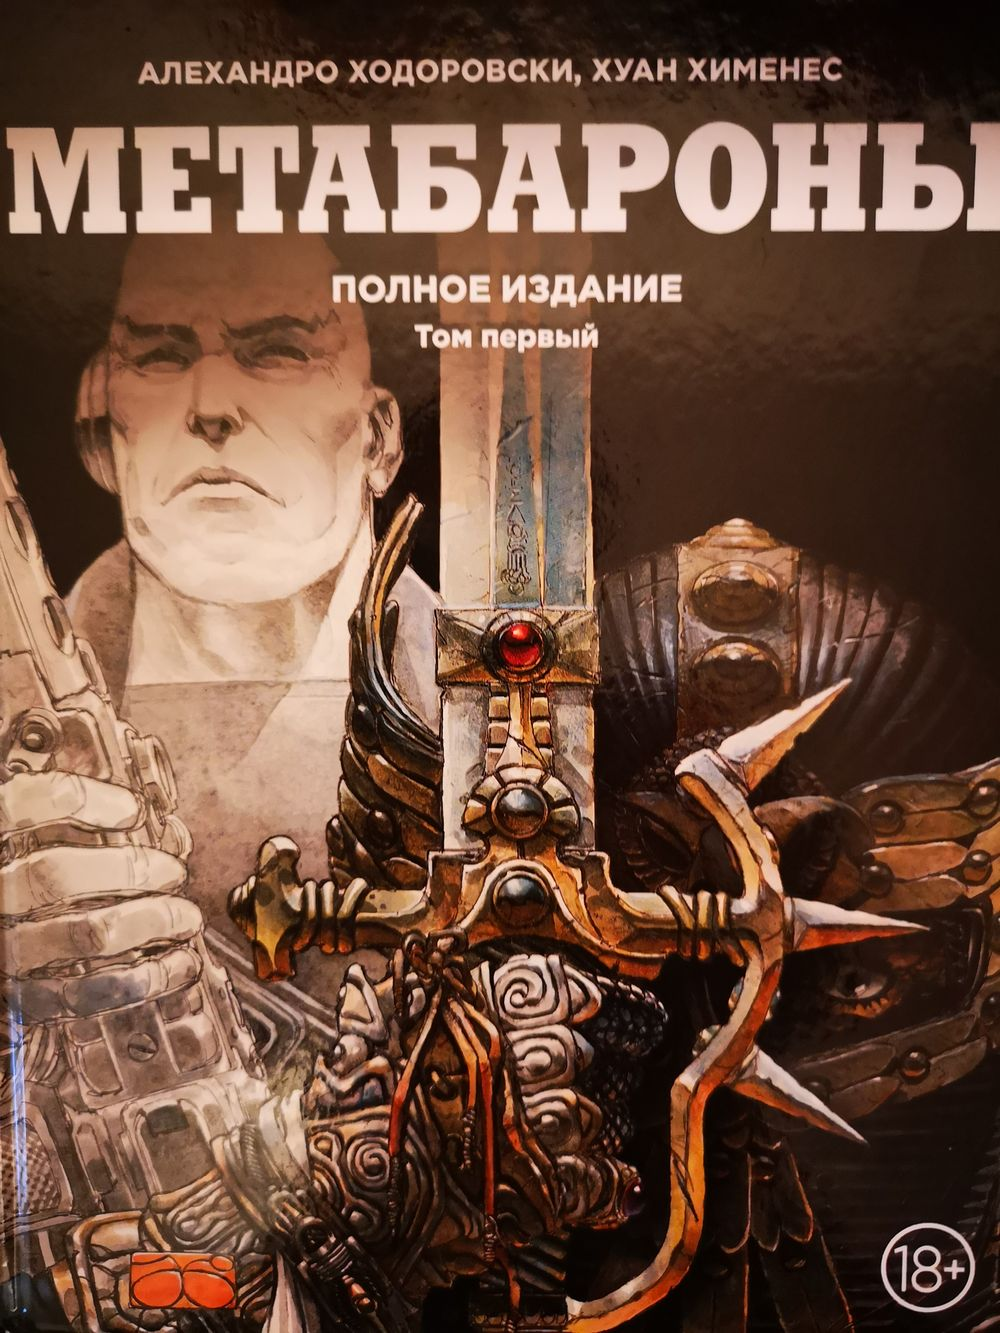 Метабароны — собственная «Дюна» Алехандро Ходоровски